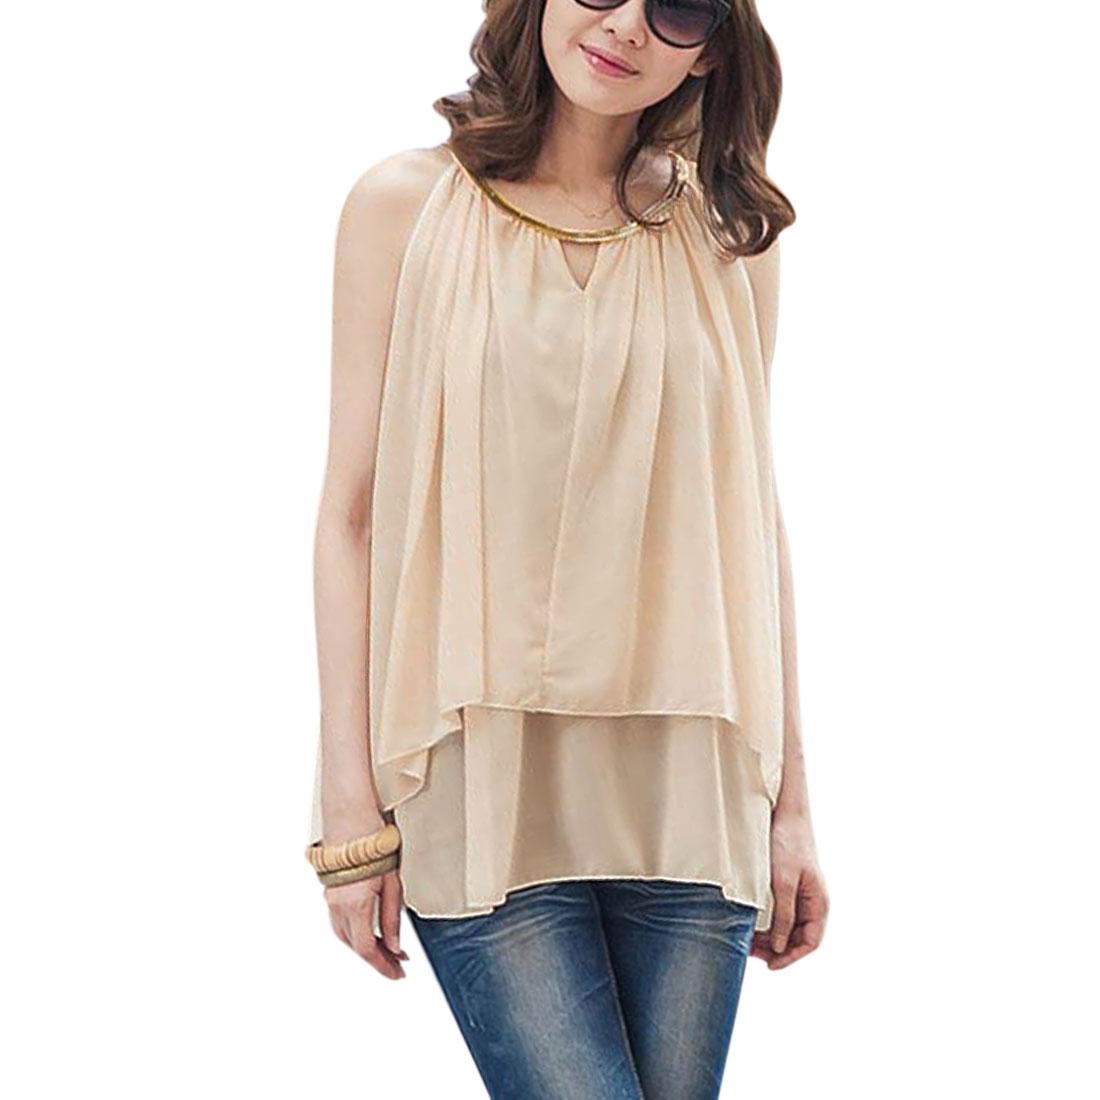 Women Chiffon Layered V Neck Hot Casual Tops Shirts Apricot S